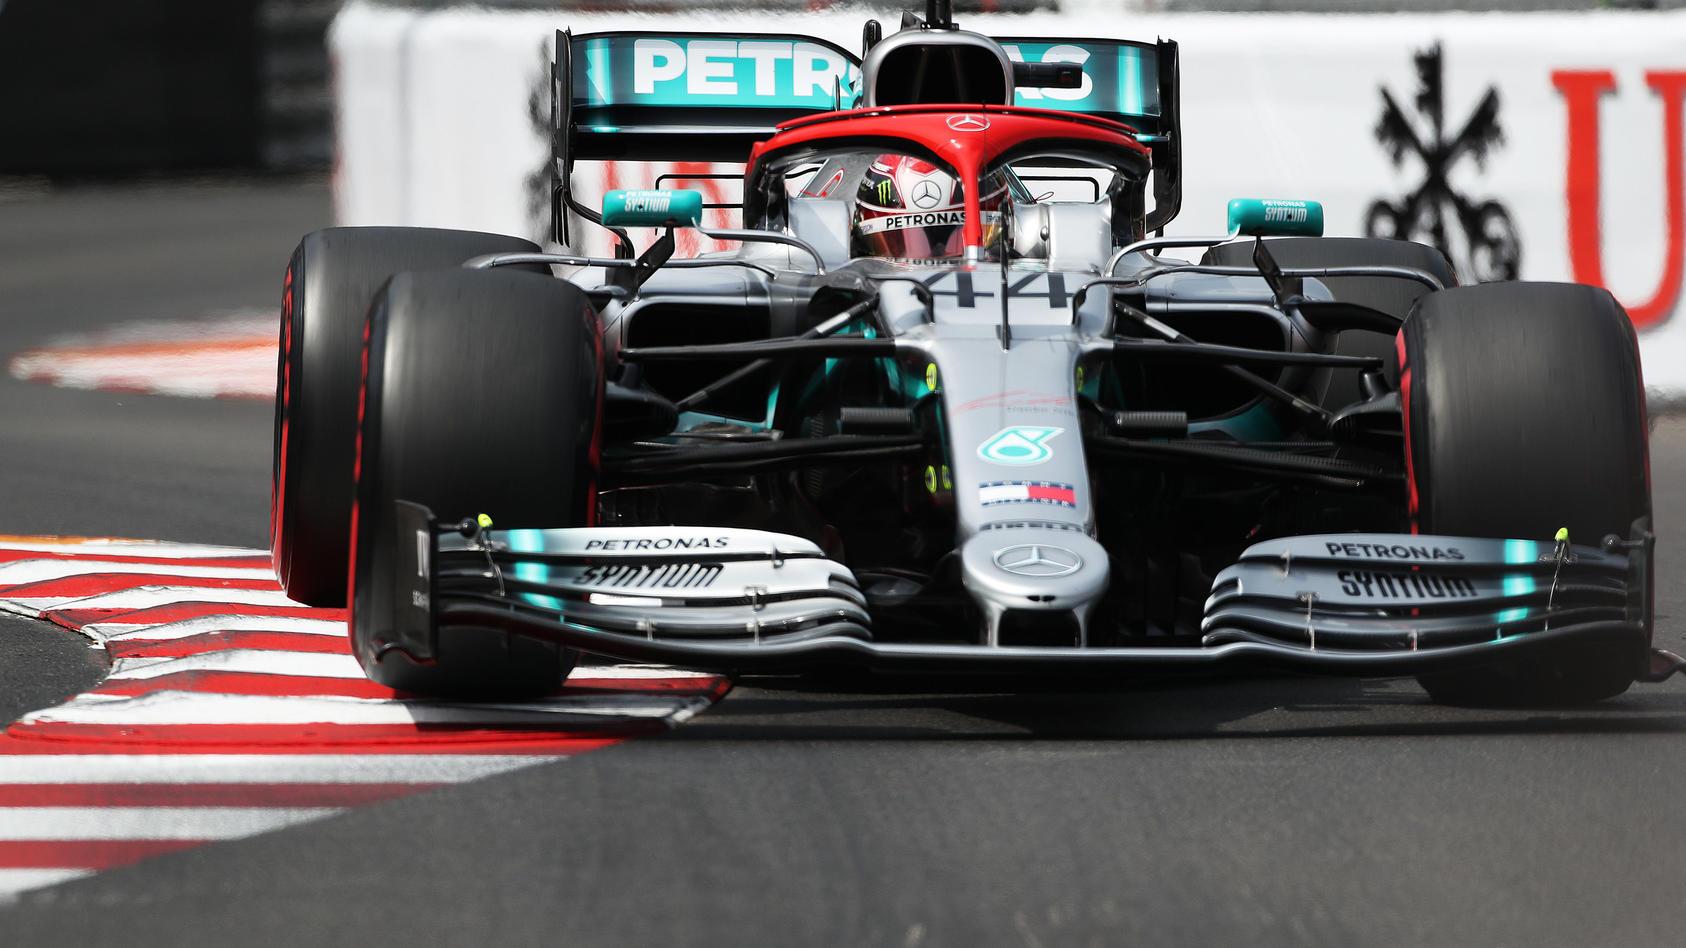 Grand Prix von Monaco - Training